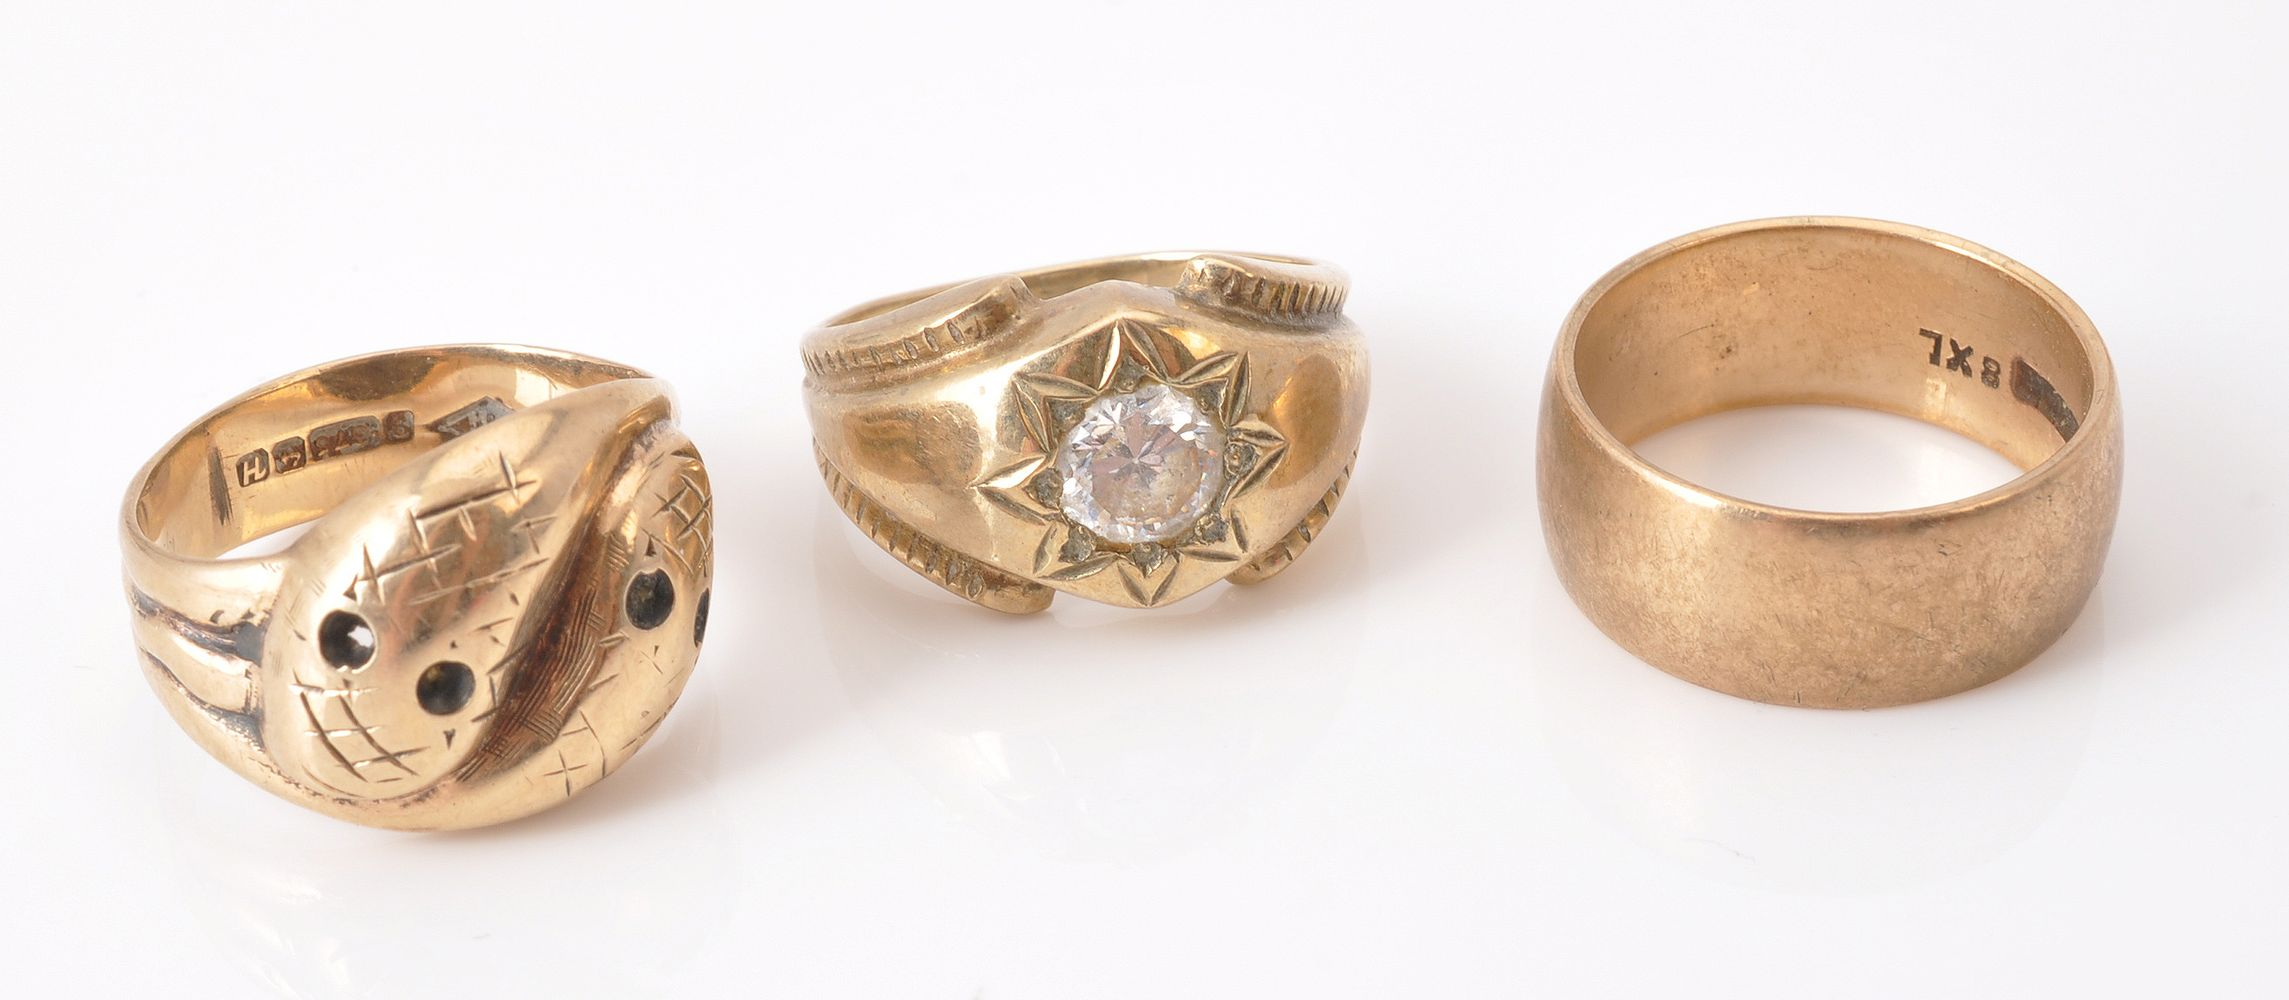 Lot 826 - A 9 carat gold serpent ring